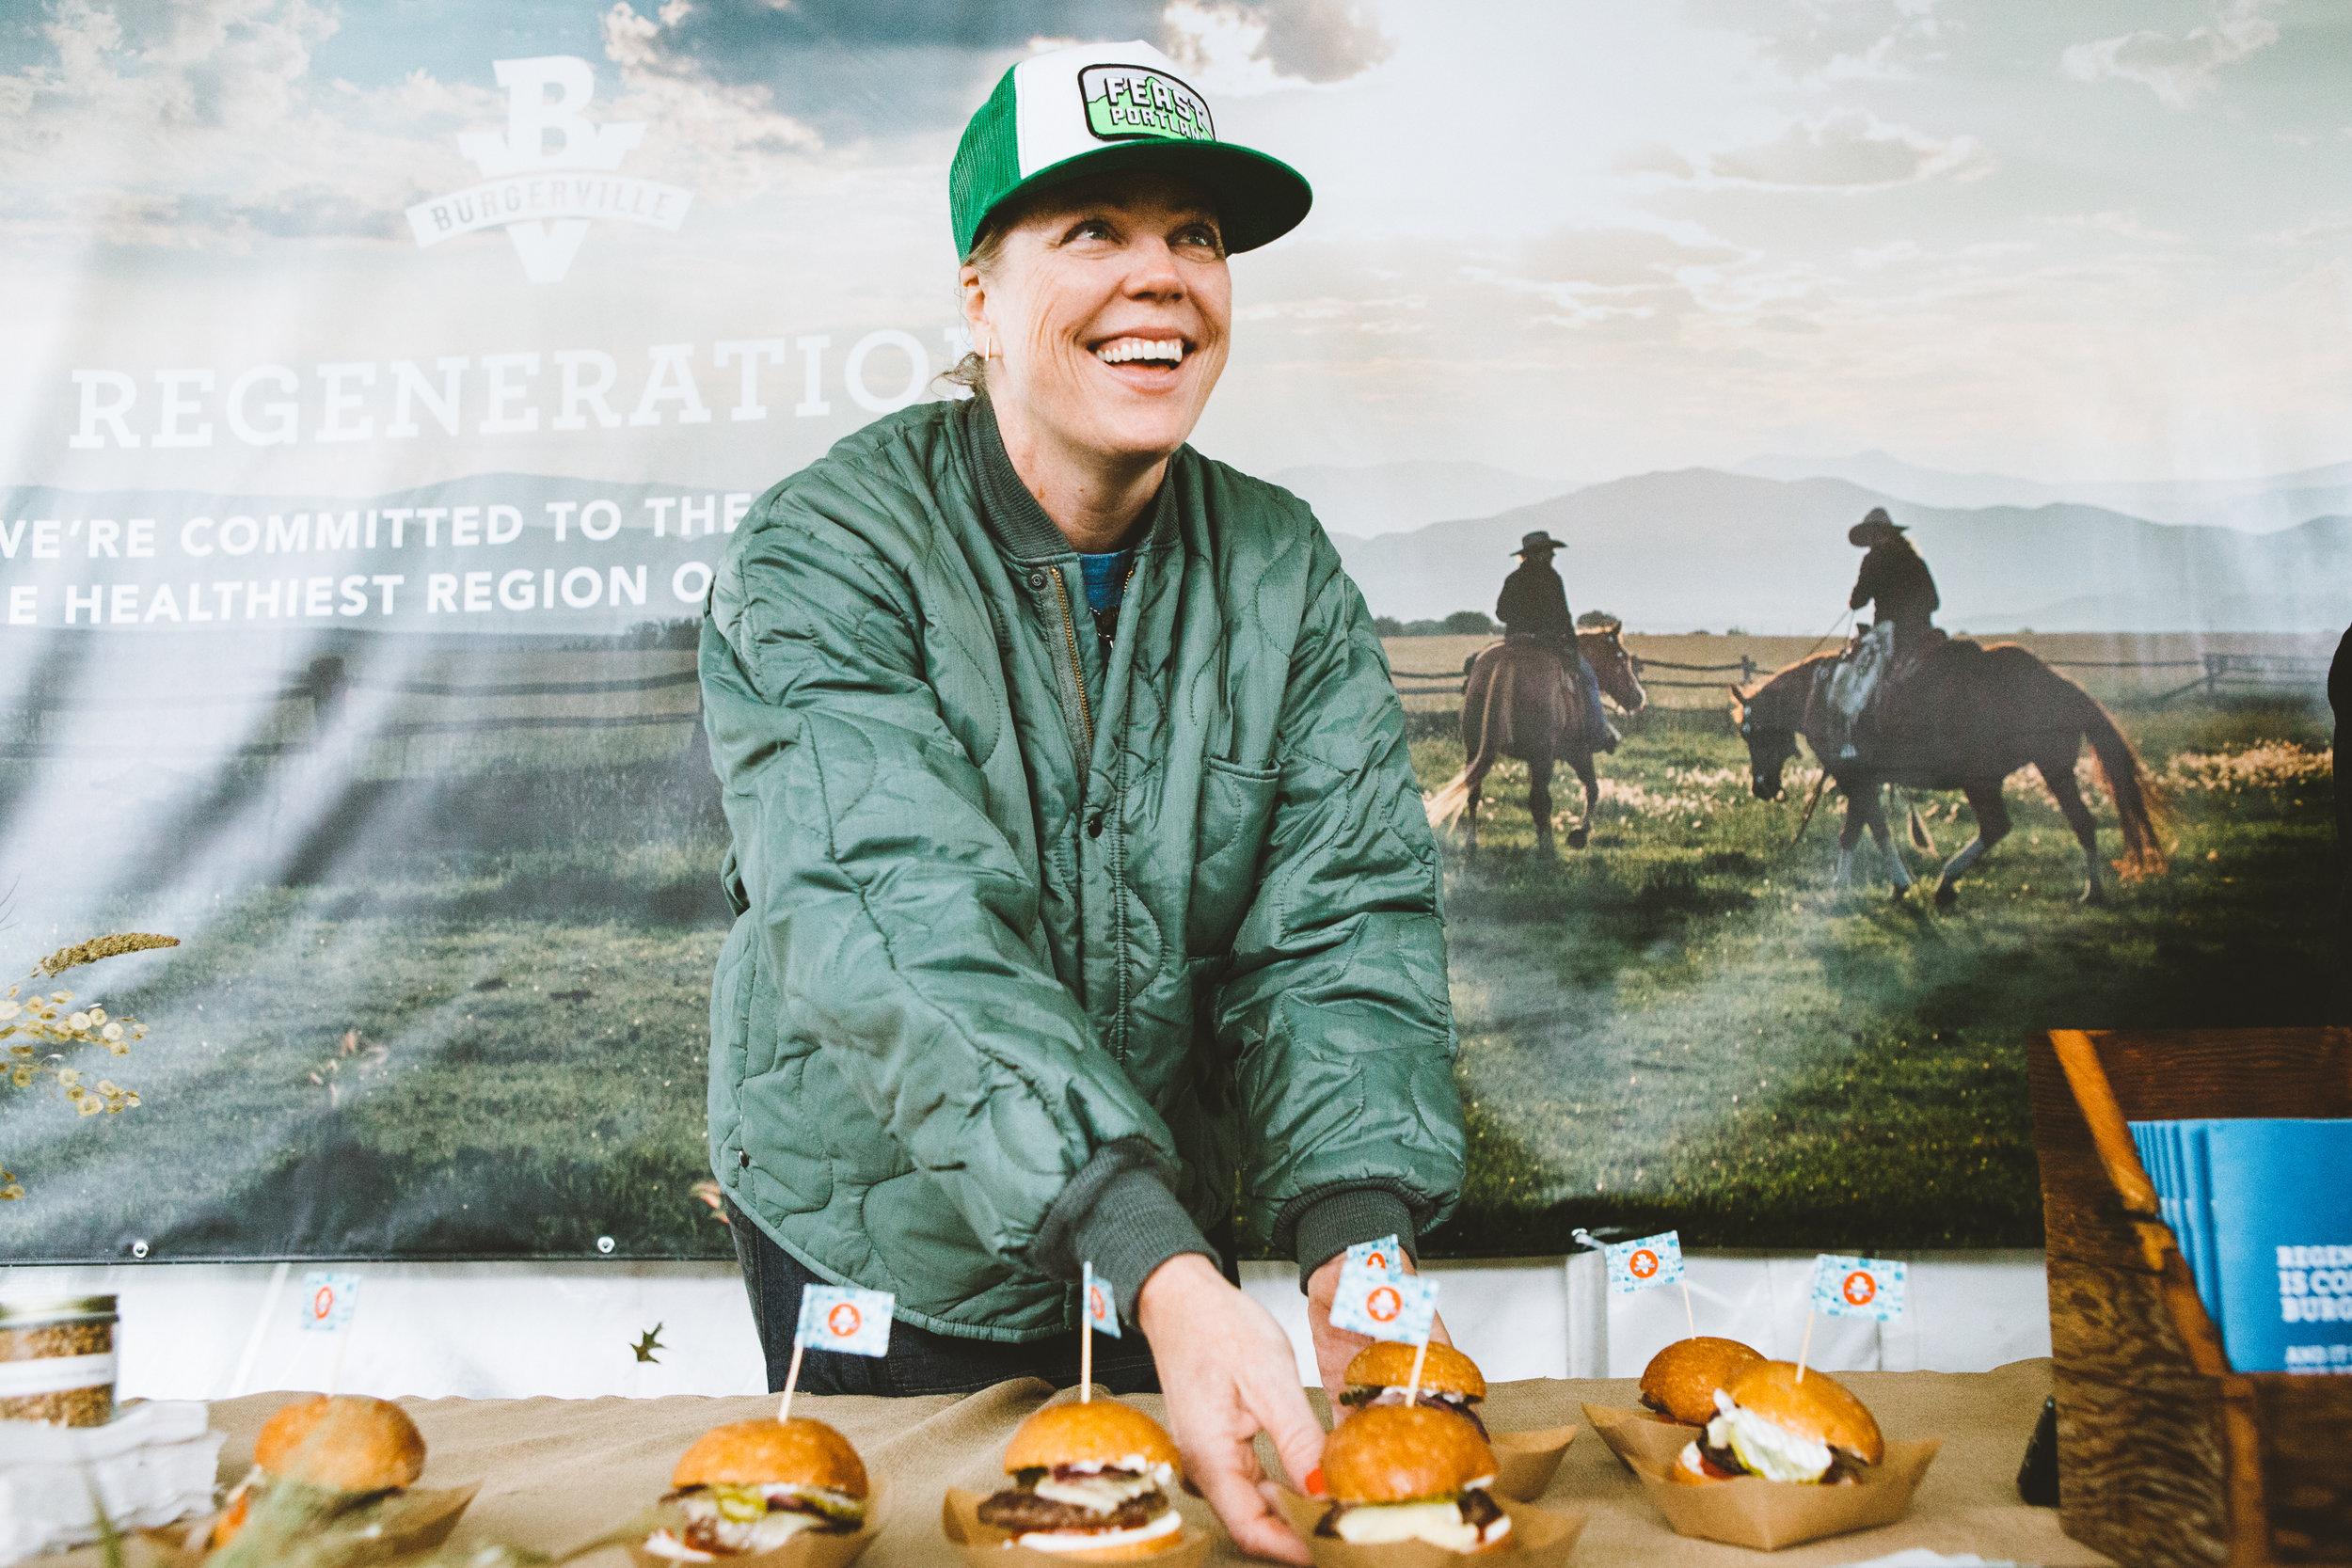 NWS Proprietress Michelle Battista slinging burgers at The Big Feast